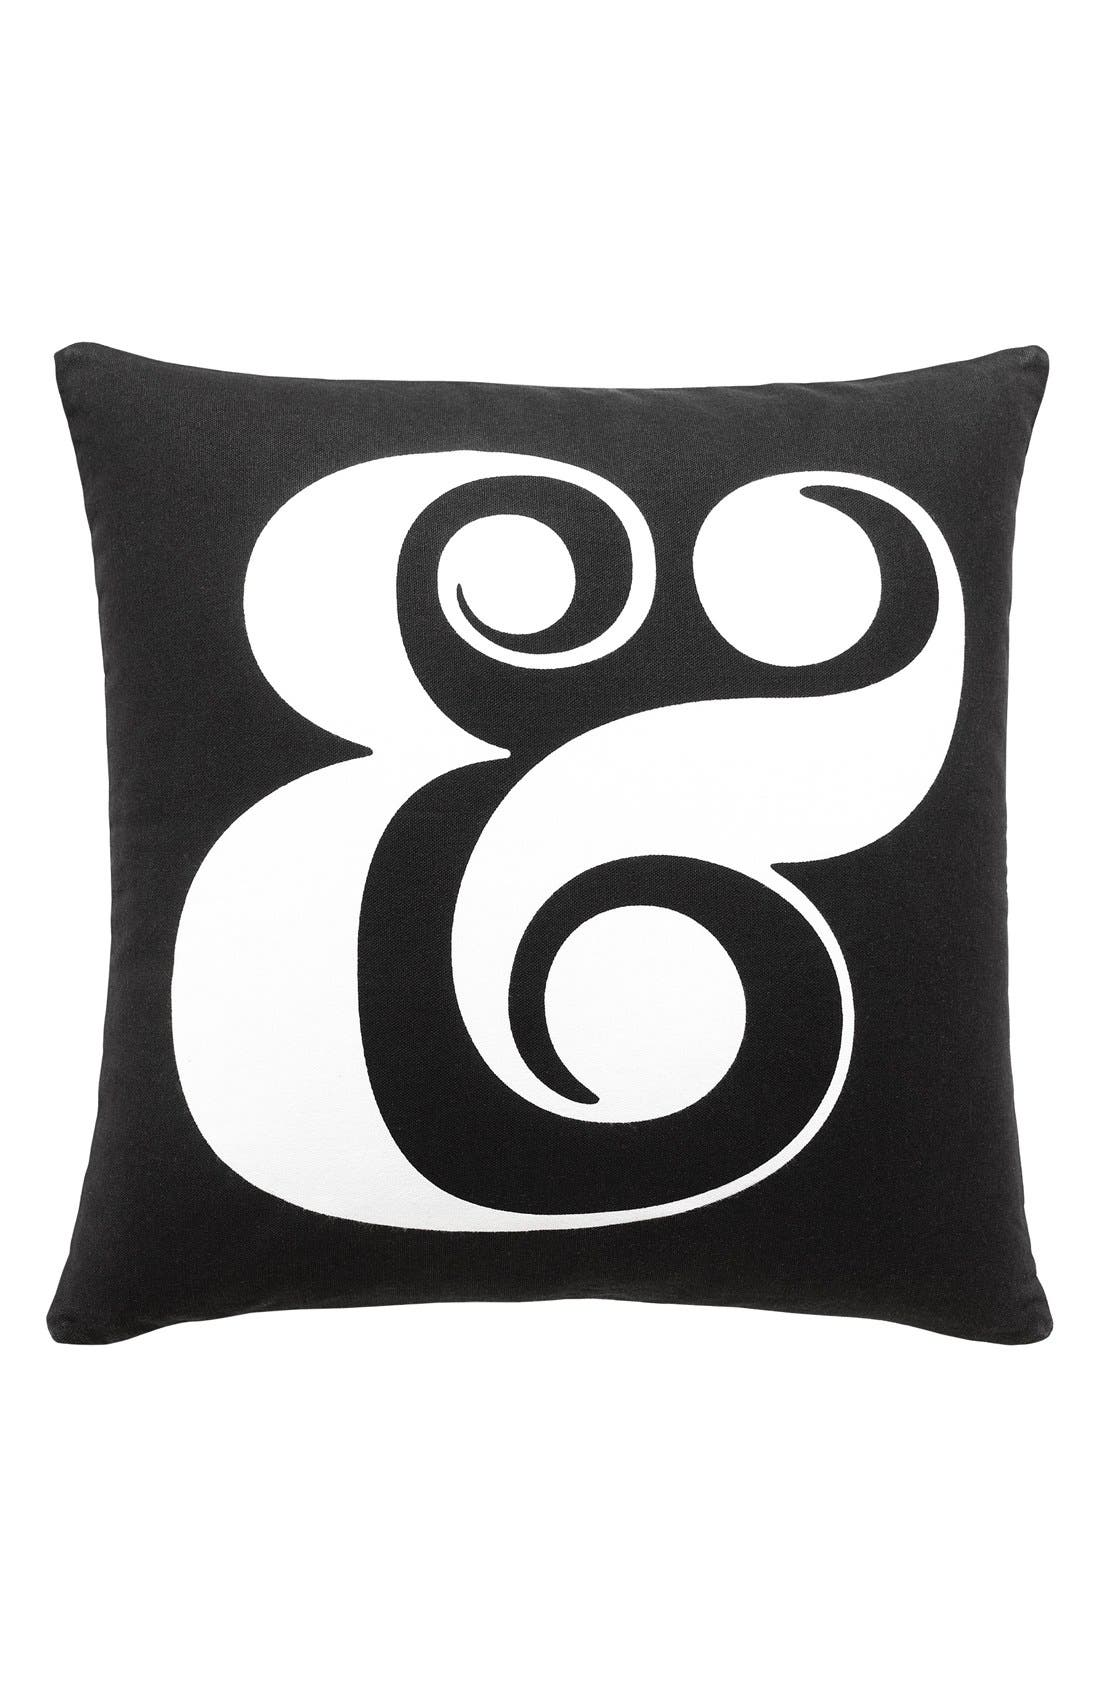 kate spade new york 'ampersand' pillow